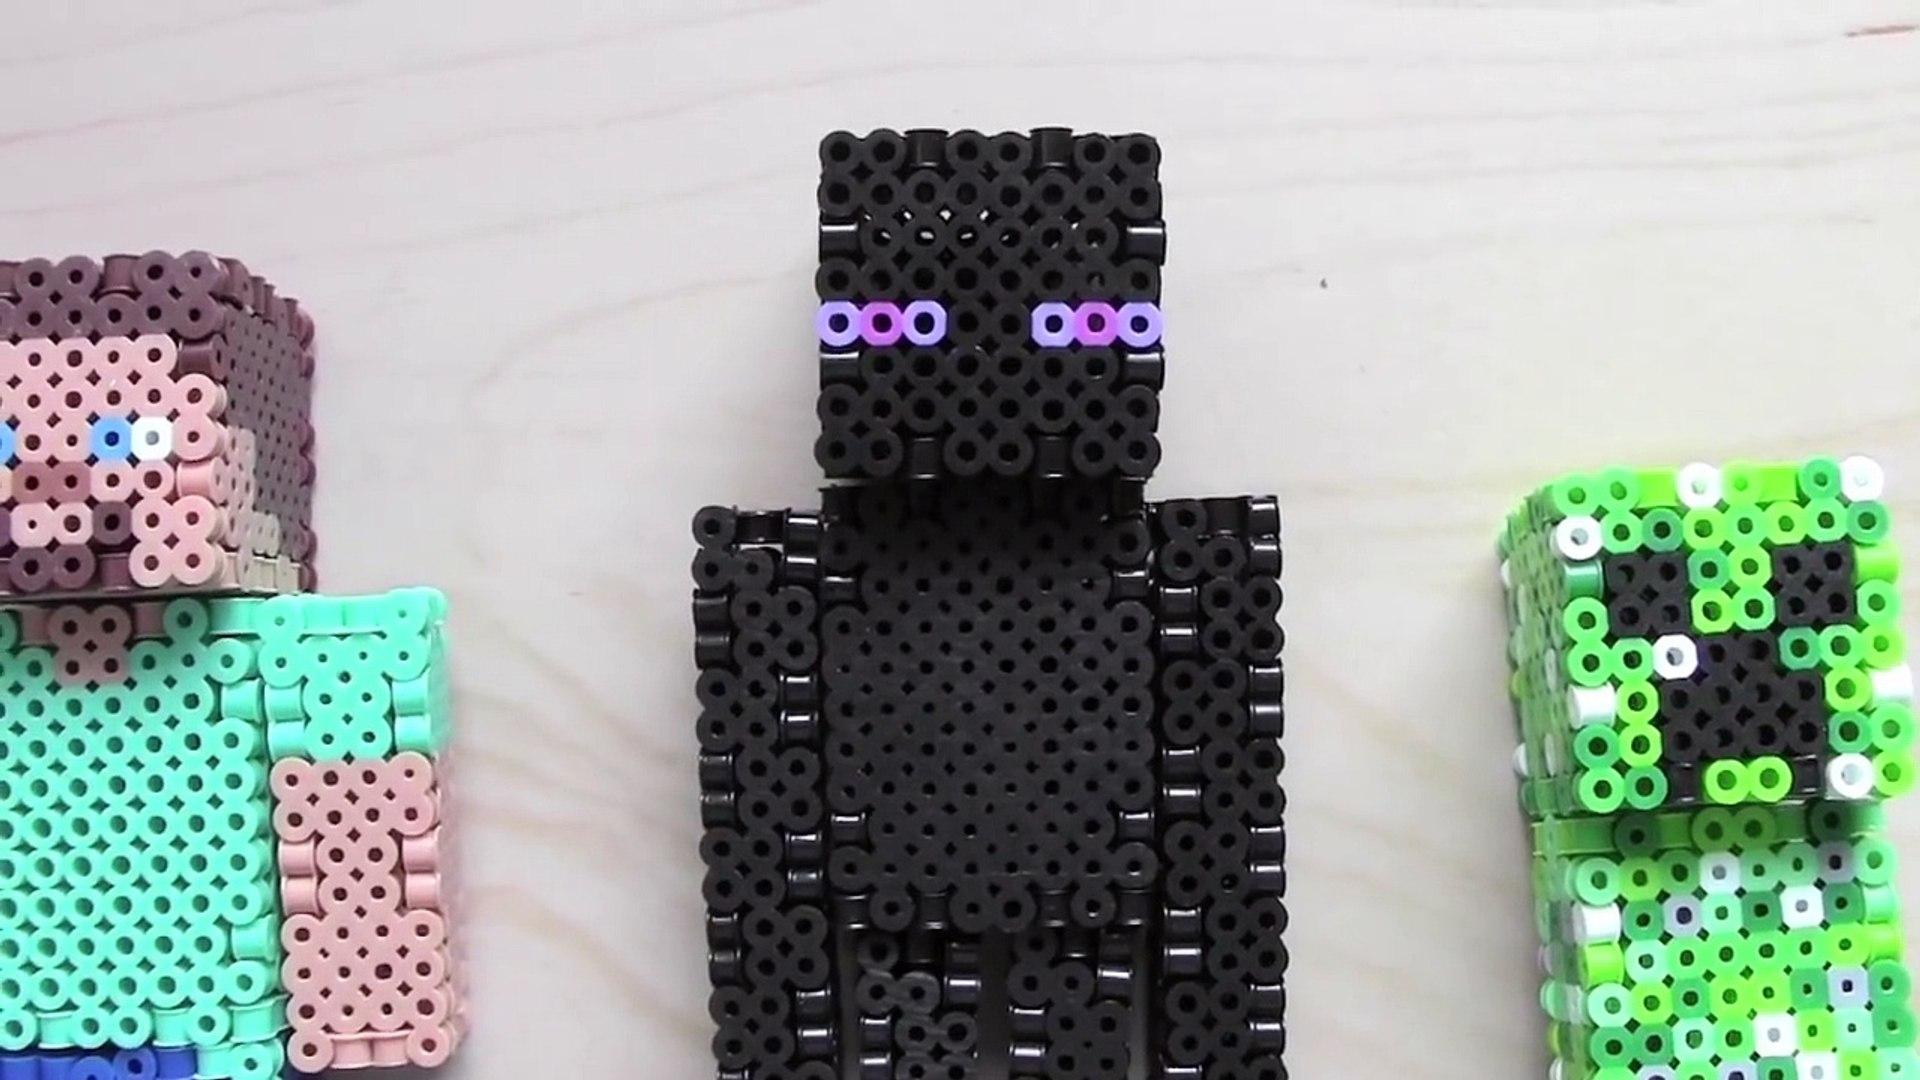 3d Perler Bead Minecraft Enderman Figure Full Tutorial